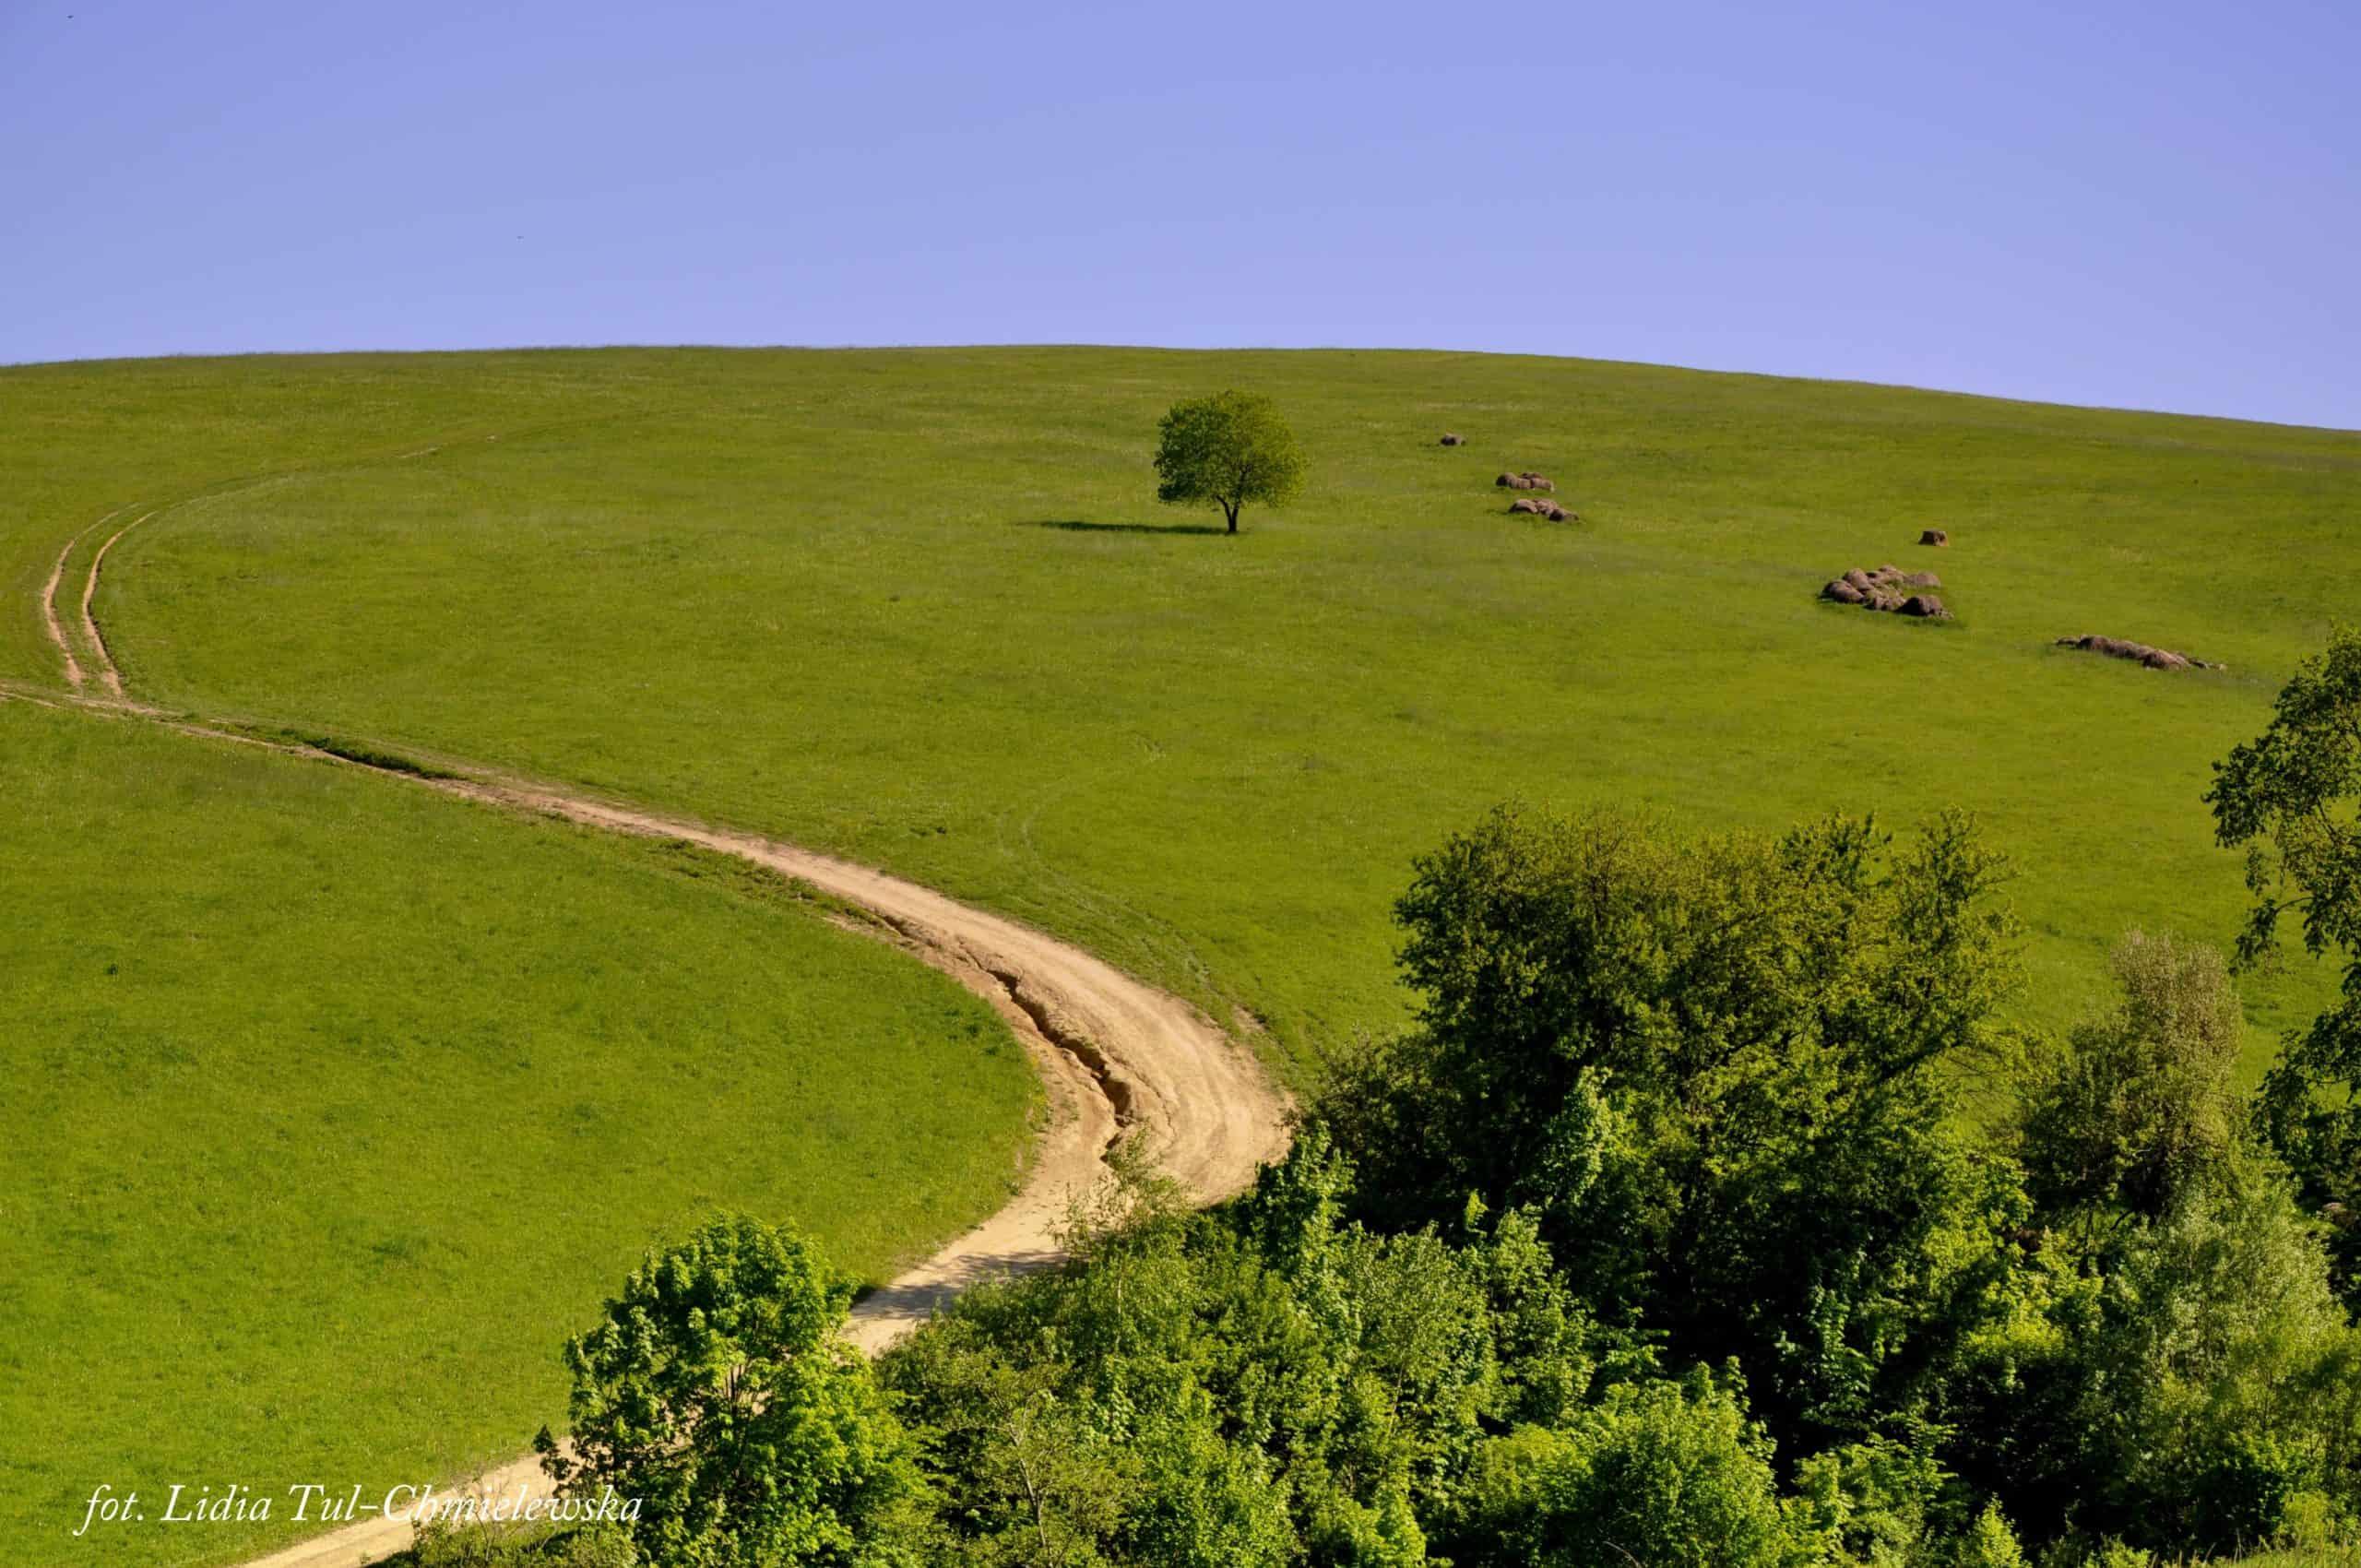 Zielono i niebiesko /fot. Lidia Tul-Chmielewska